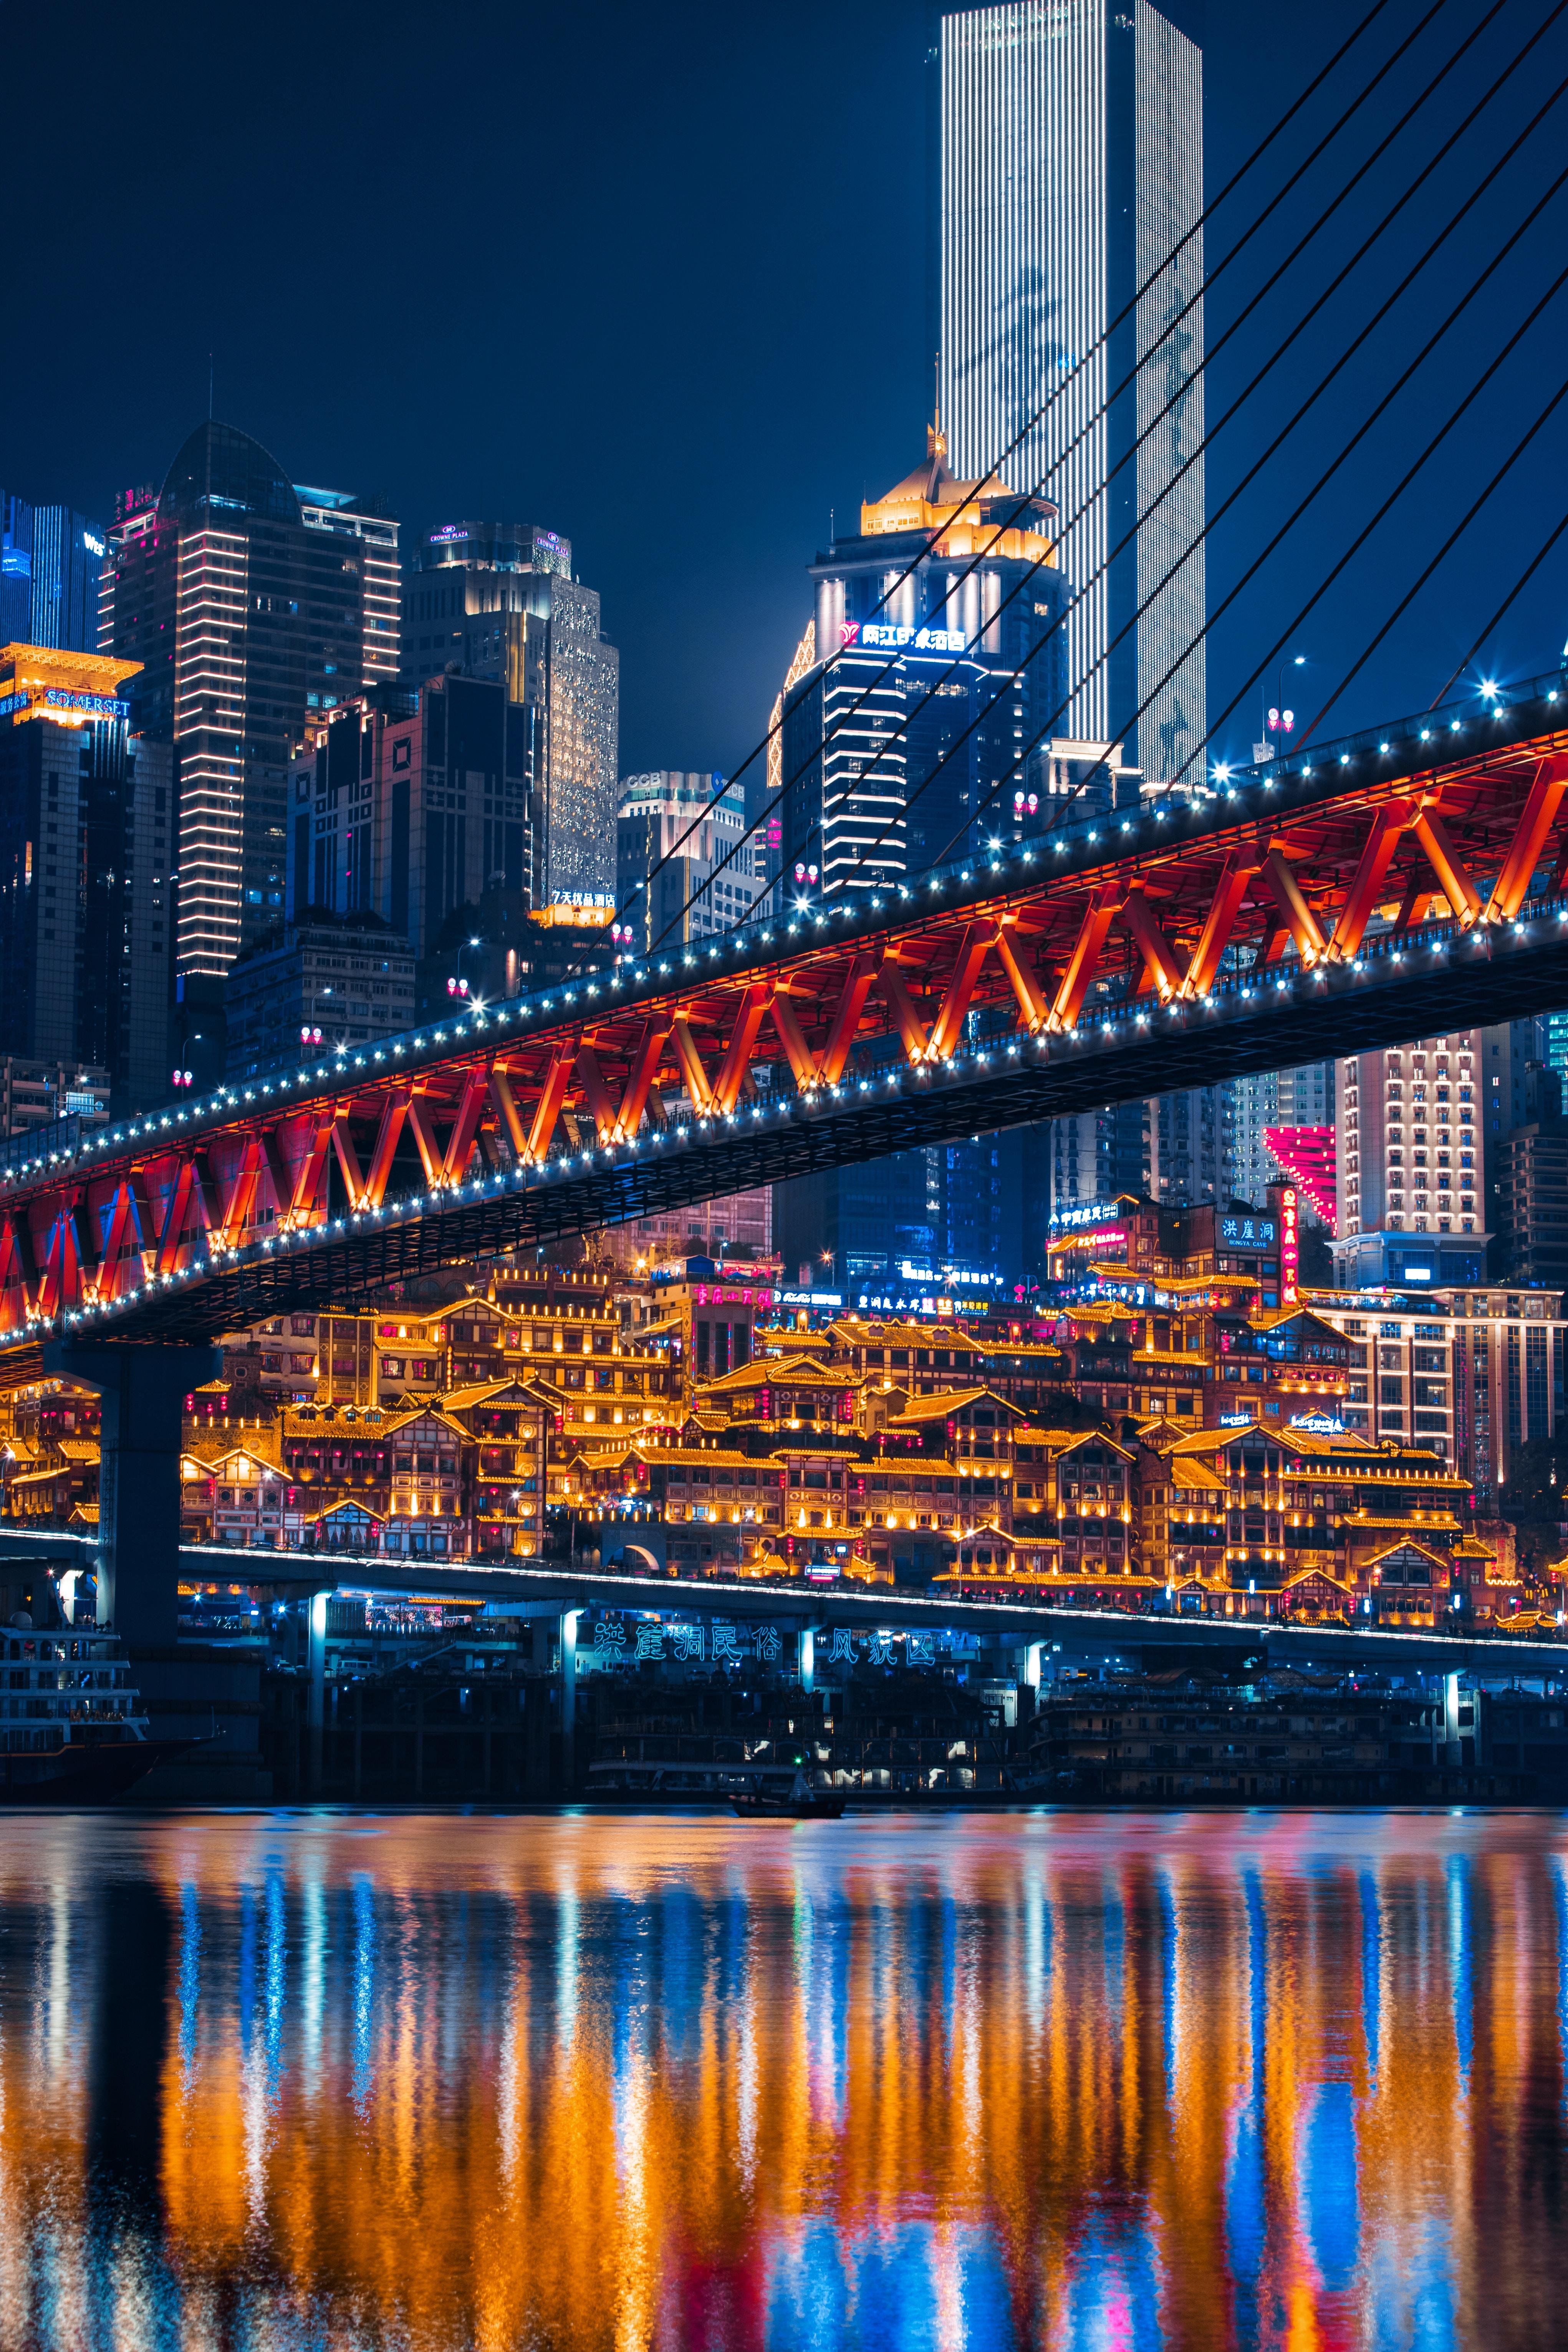 lighted bridge across calm water